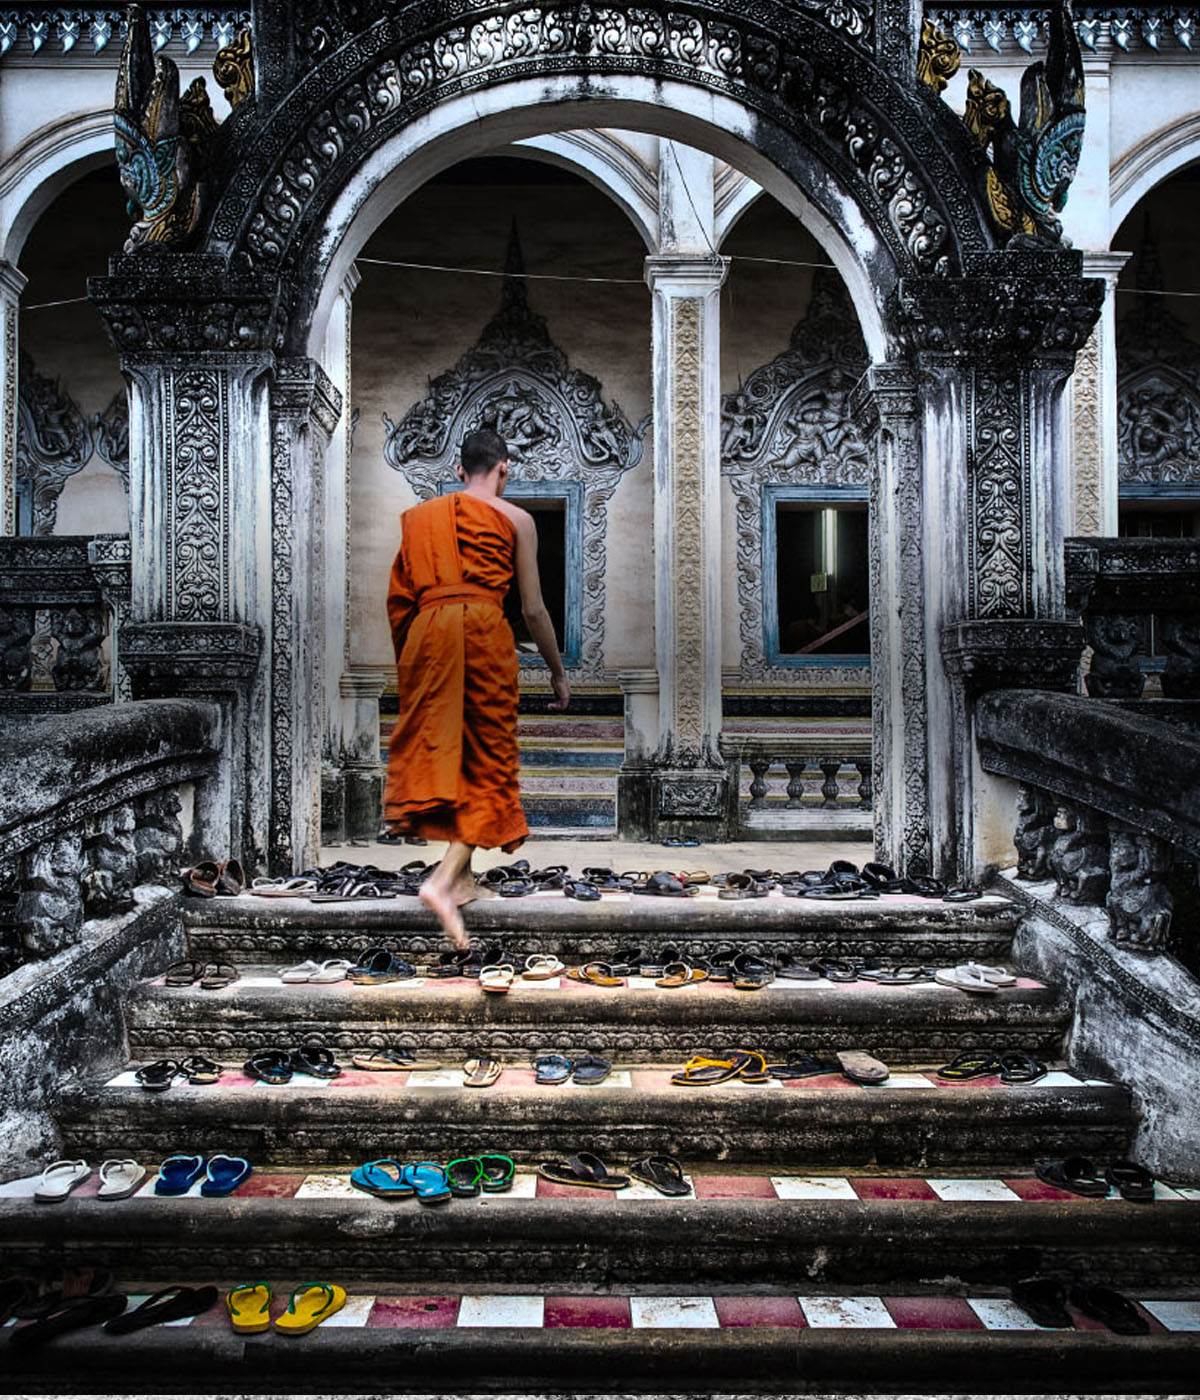 La ruta del Mekong y Templos de Angkor